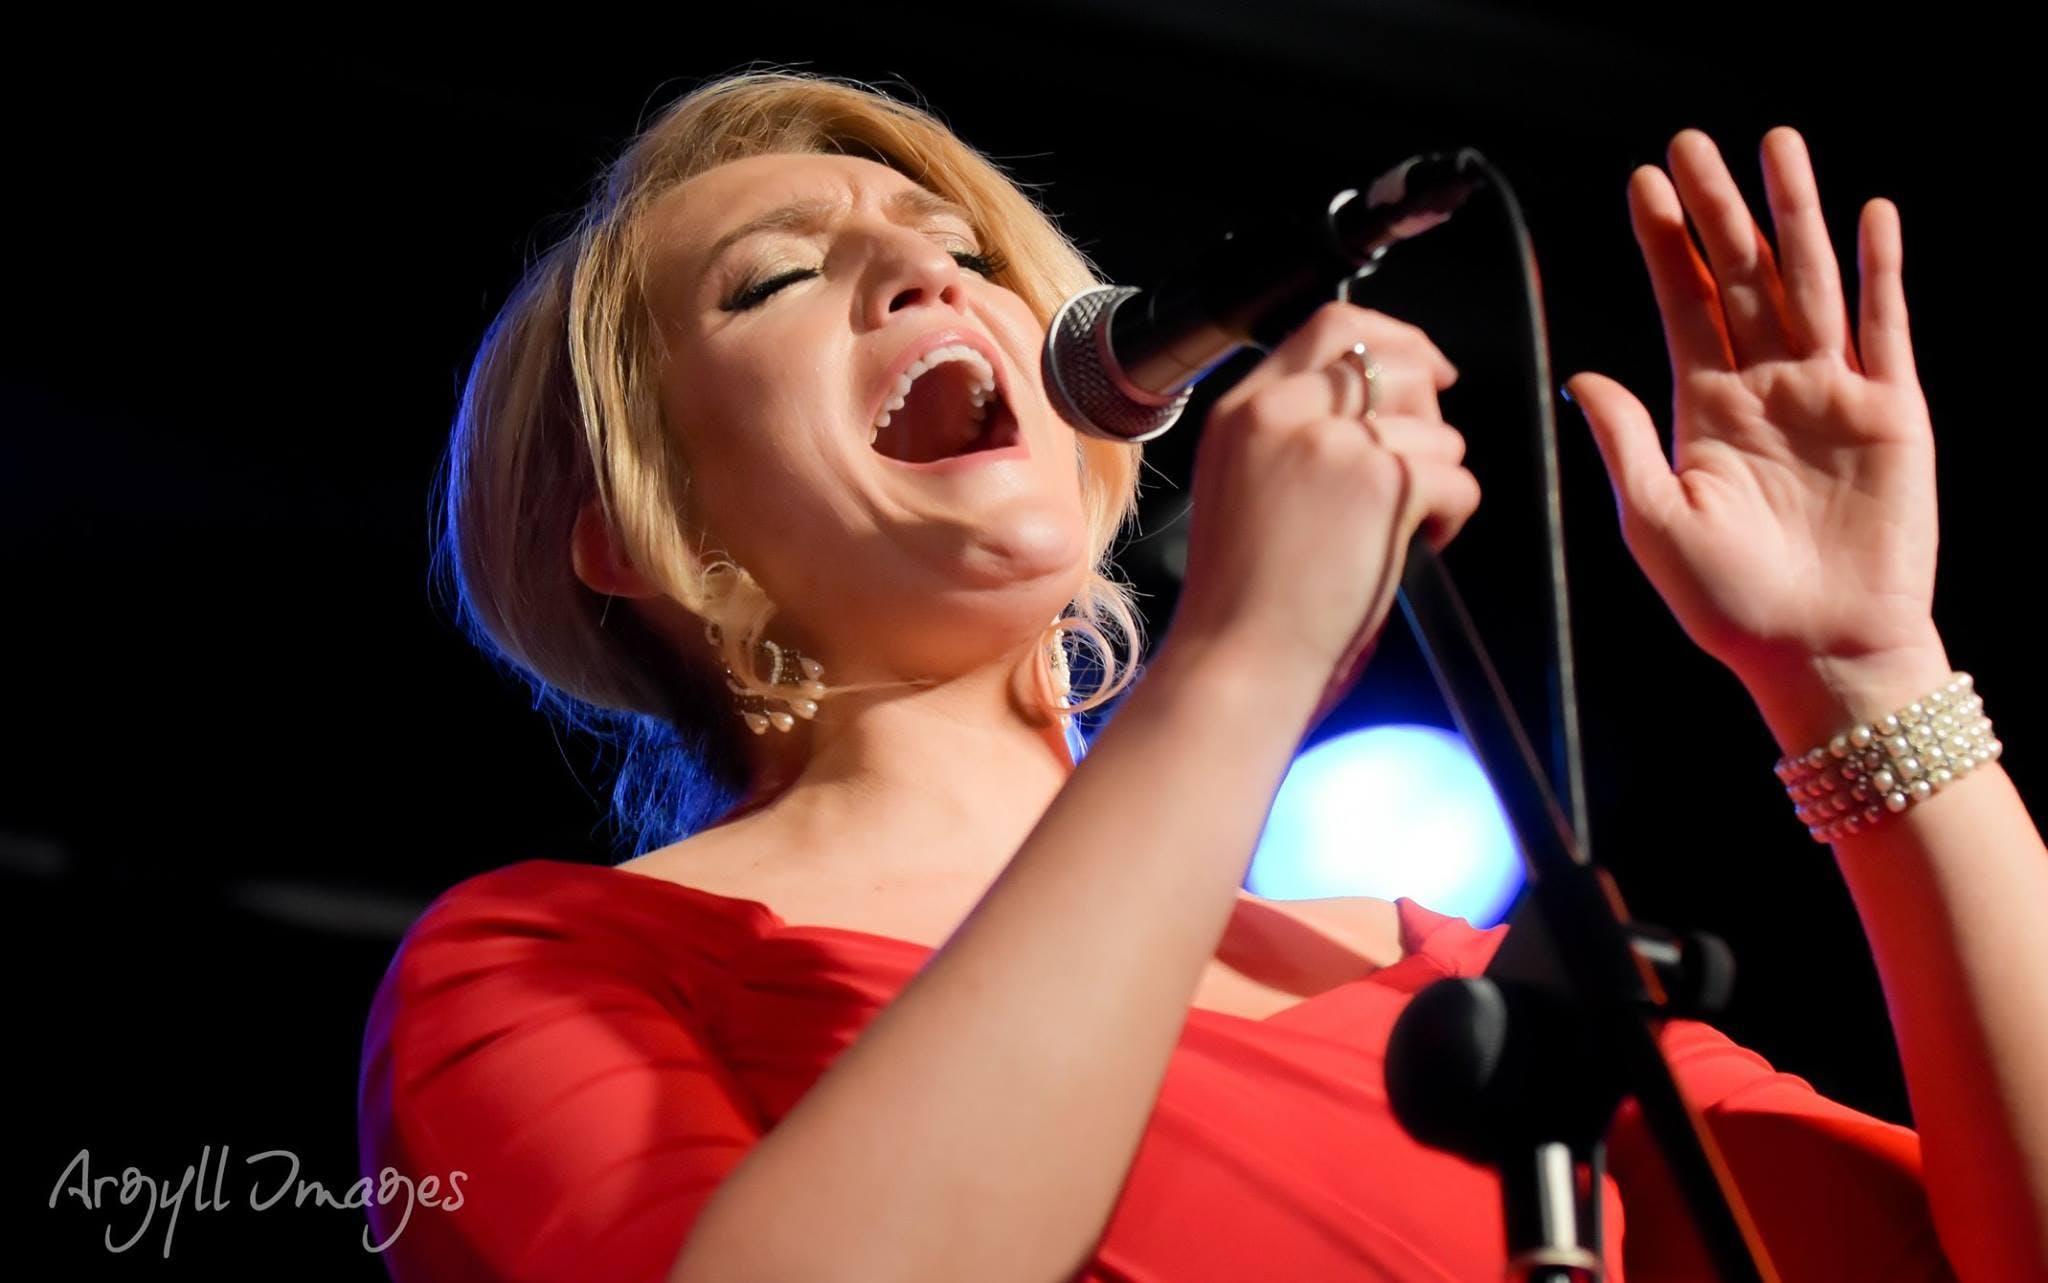 Amanda St John & Friends sing 'Songs of my he